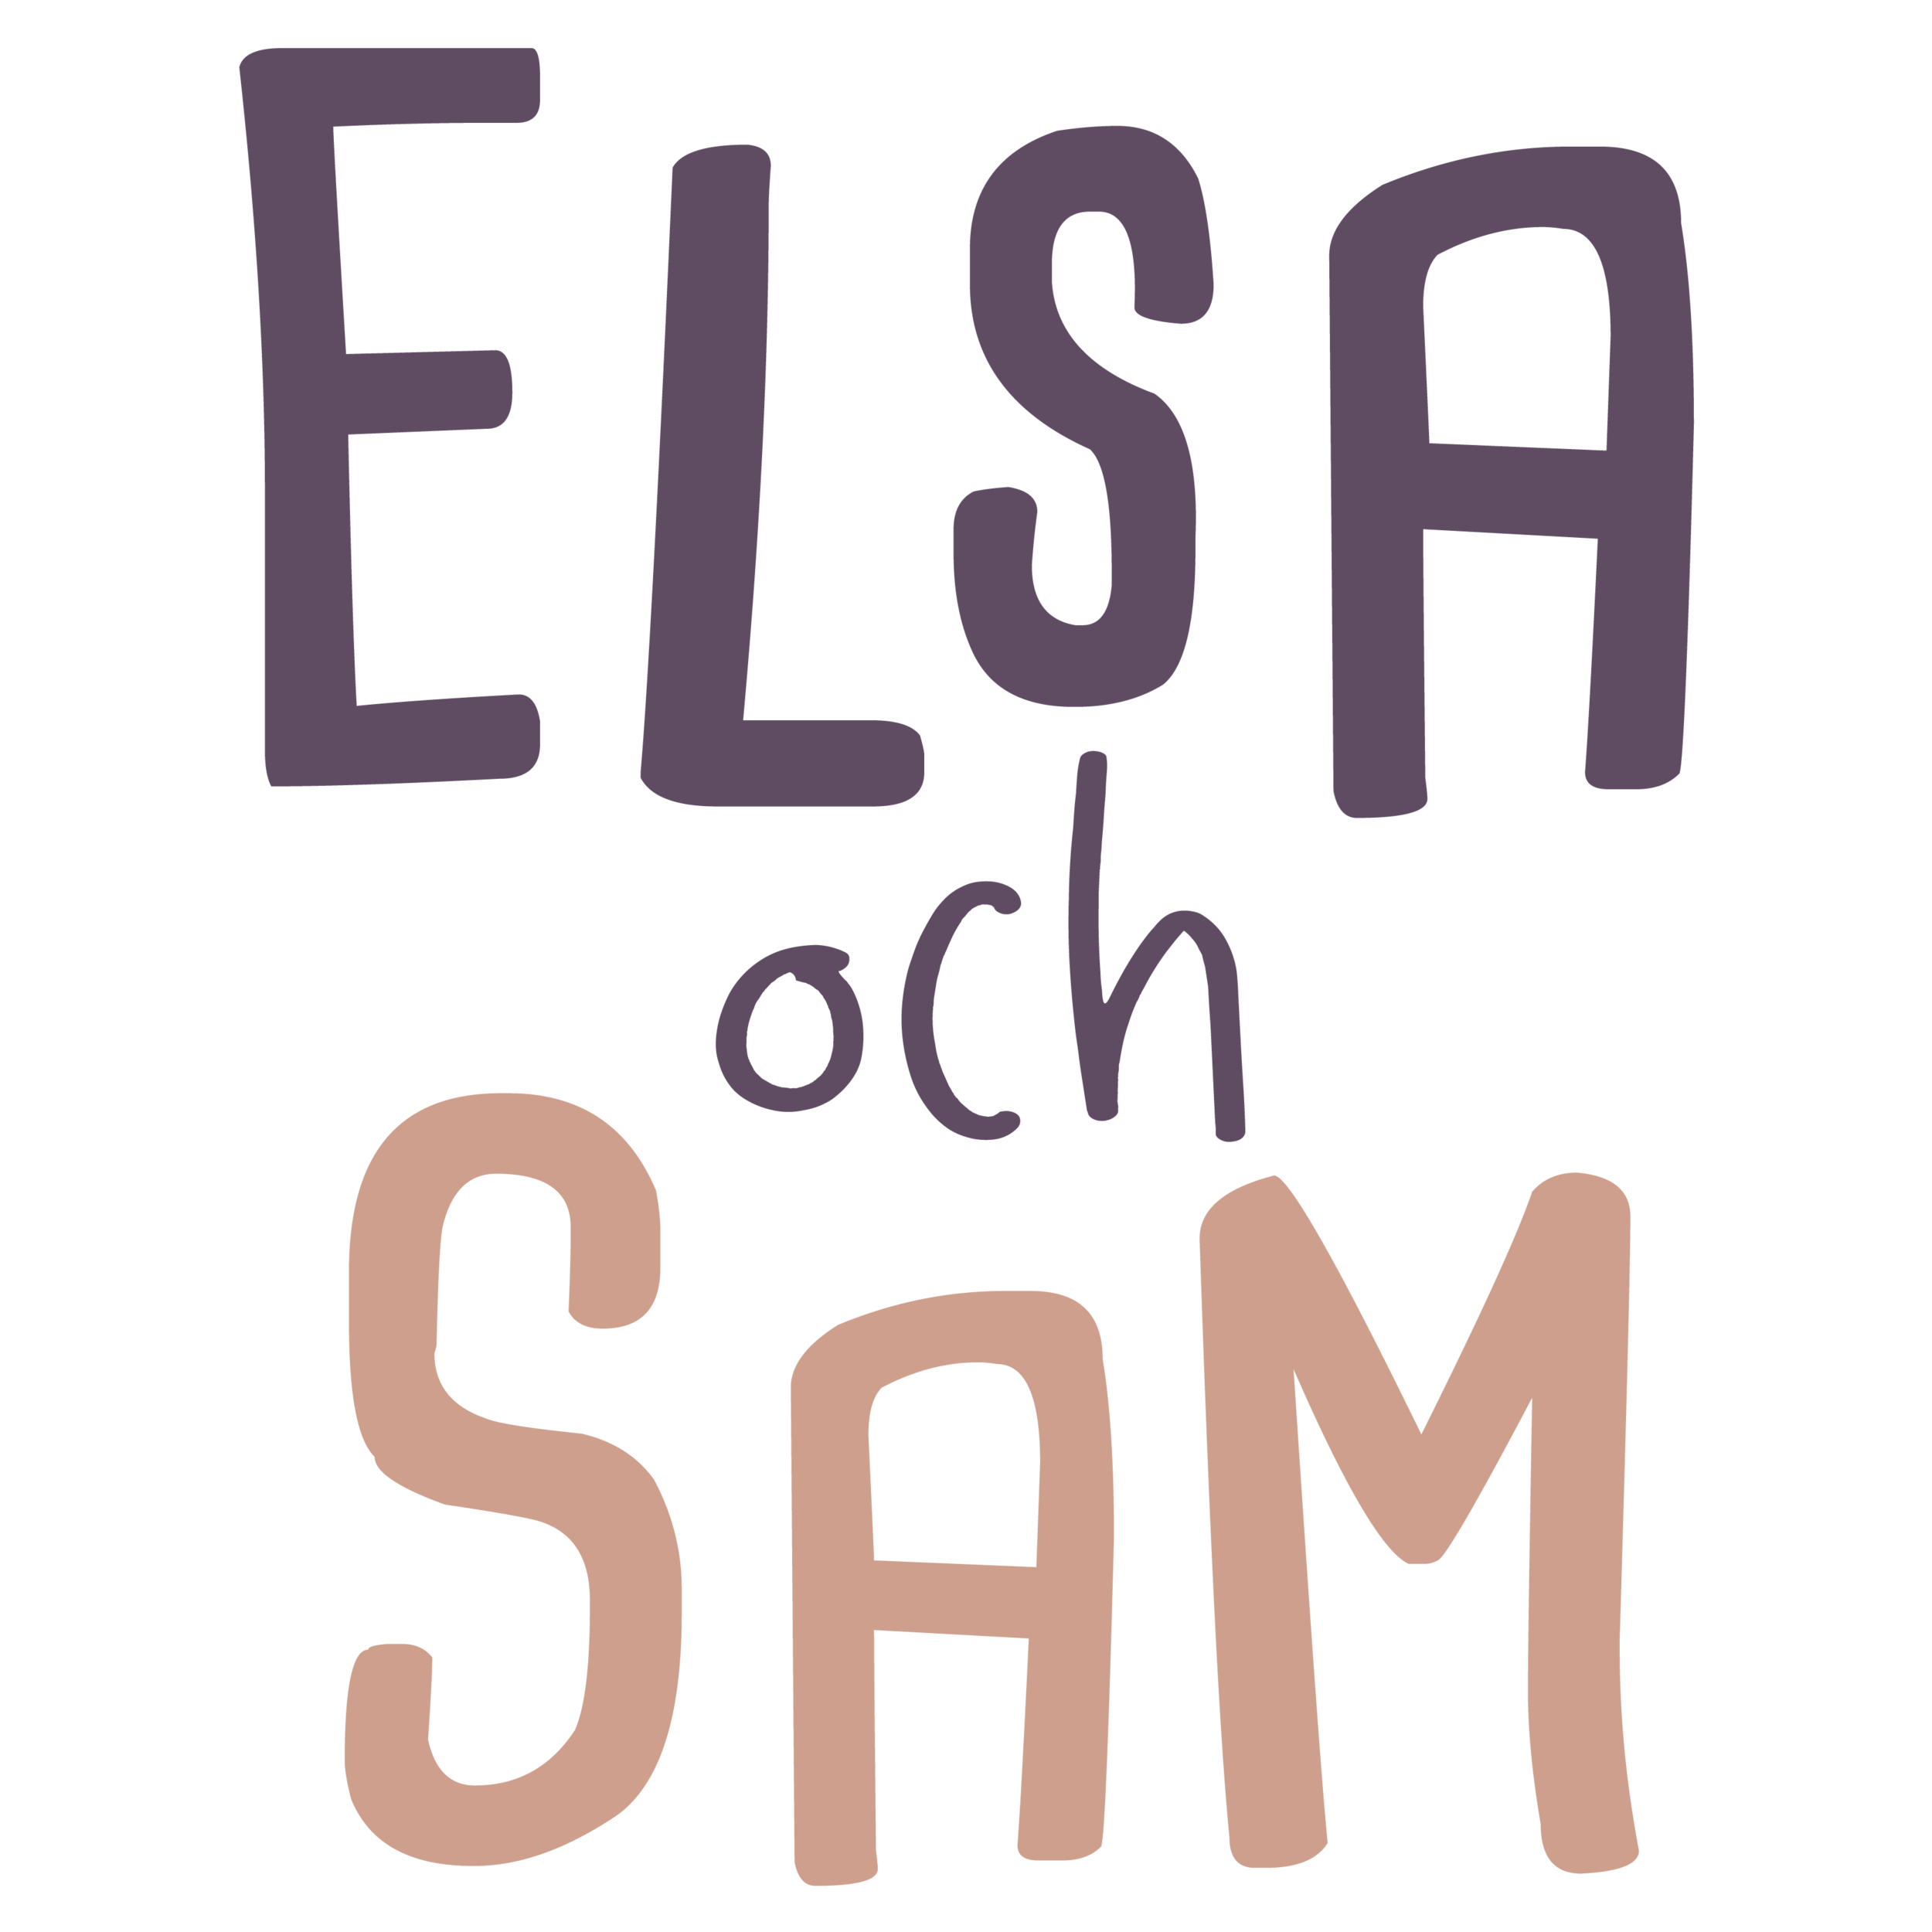 Elsa_Sam_stående-färg (1).png